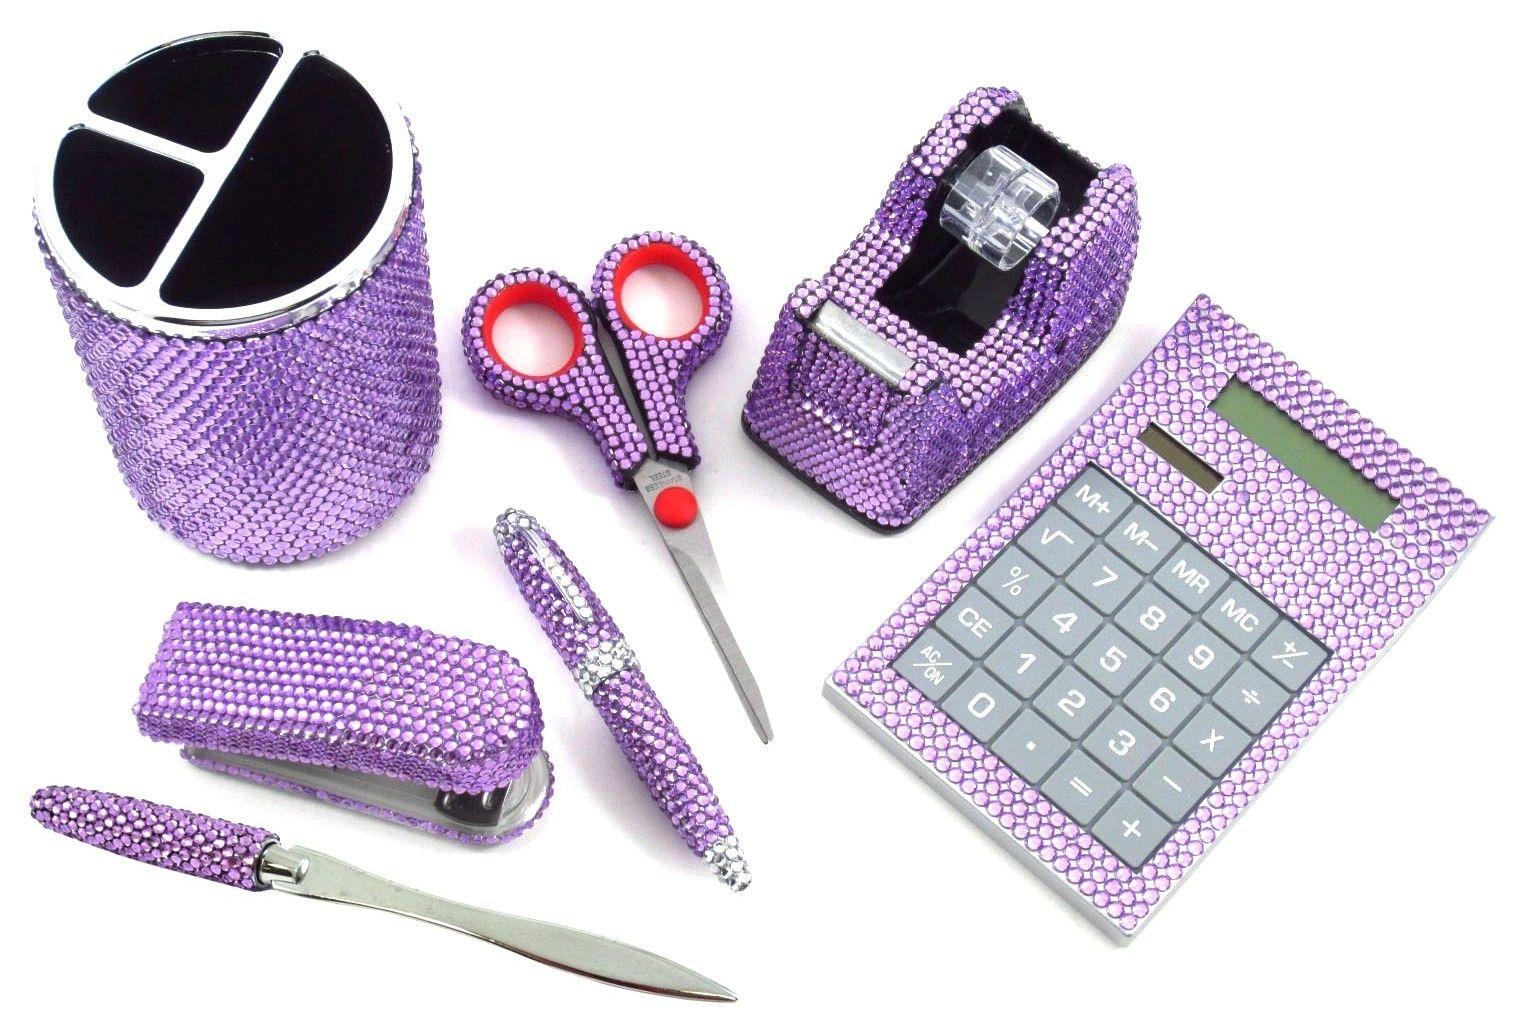 Purple Office Accessories | Piece Purple Crystal Office Supplies Set: Pen  Holder, Scissors,